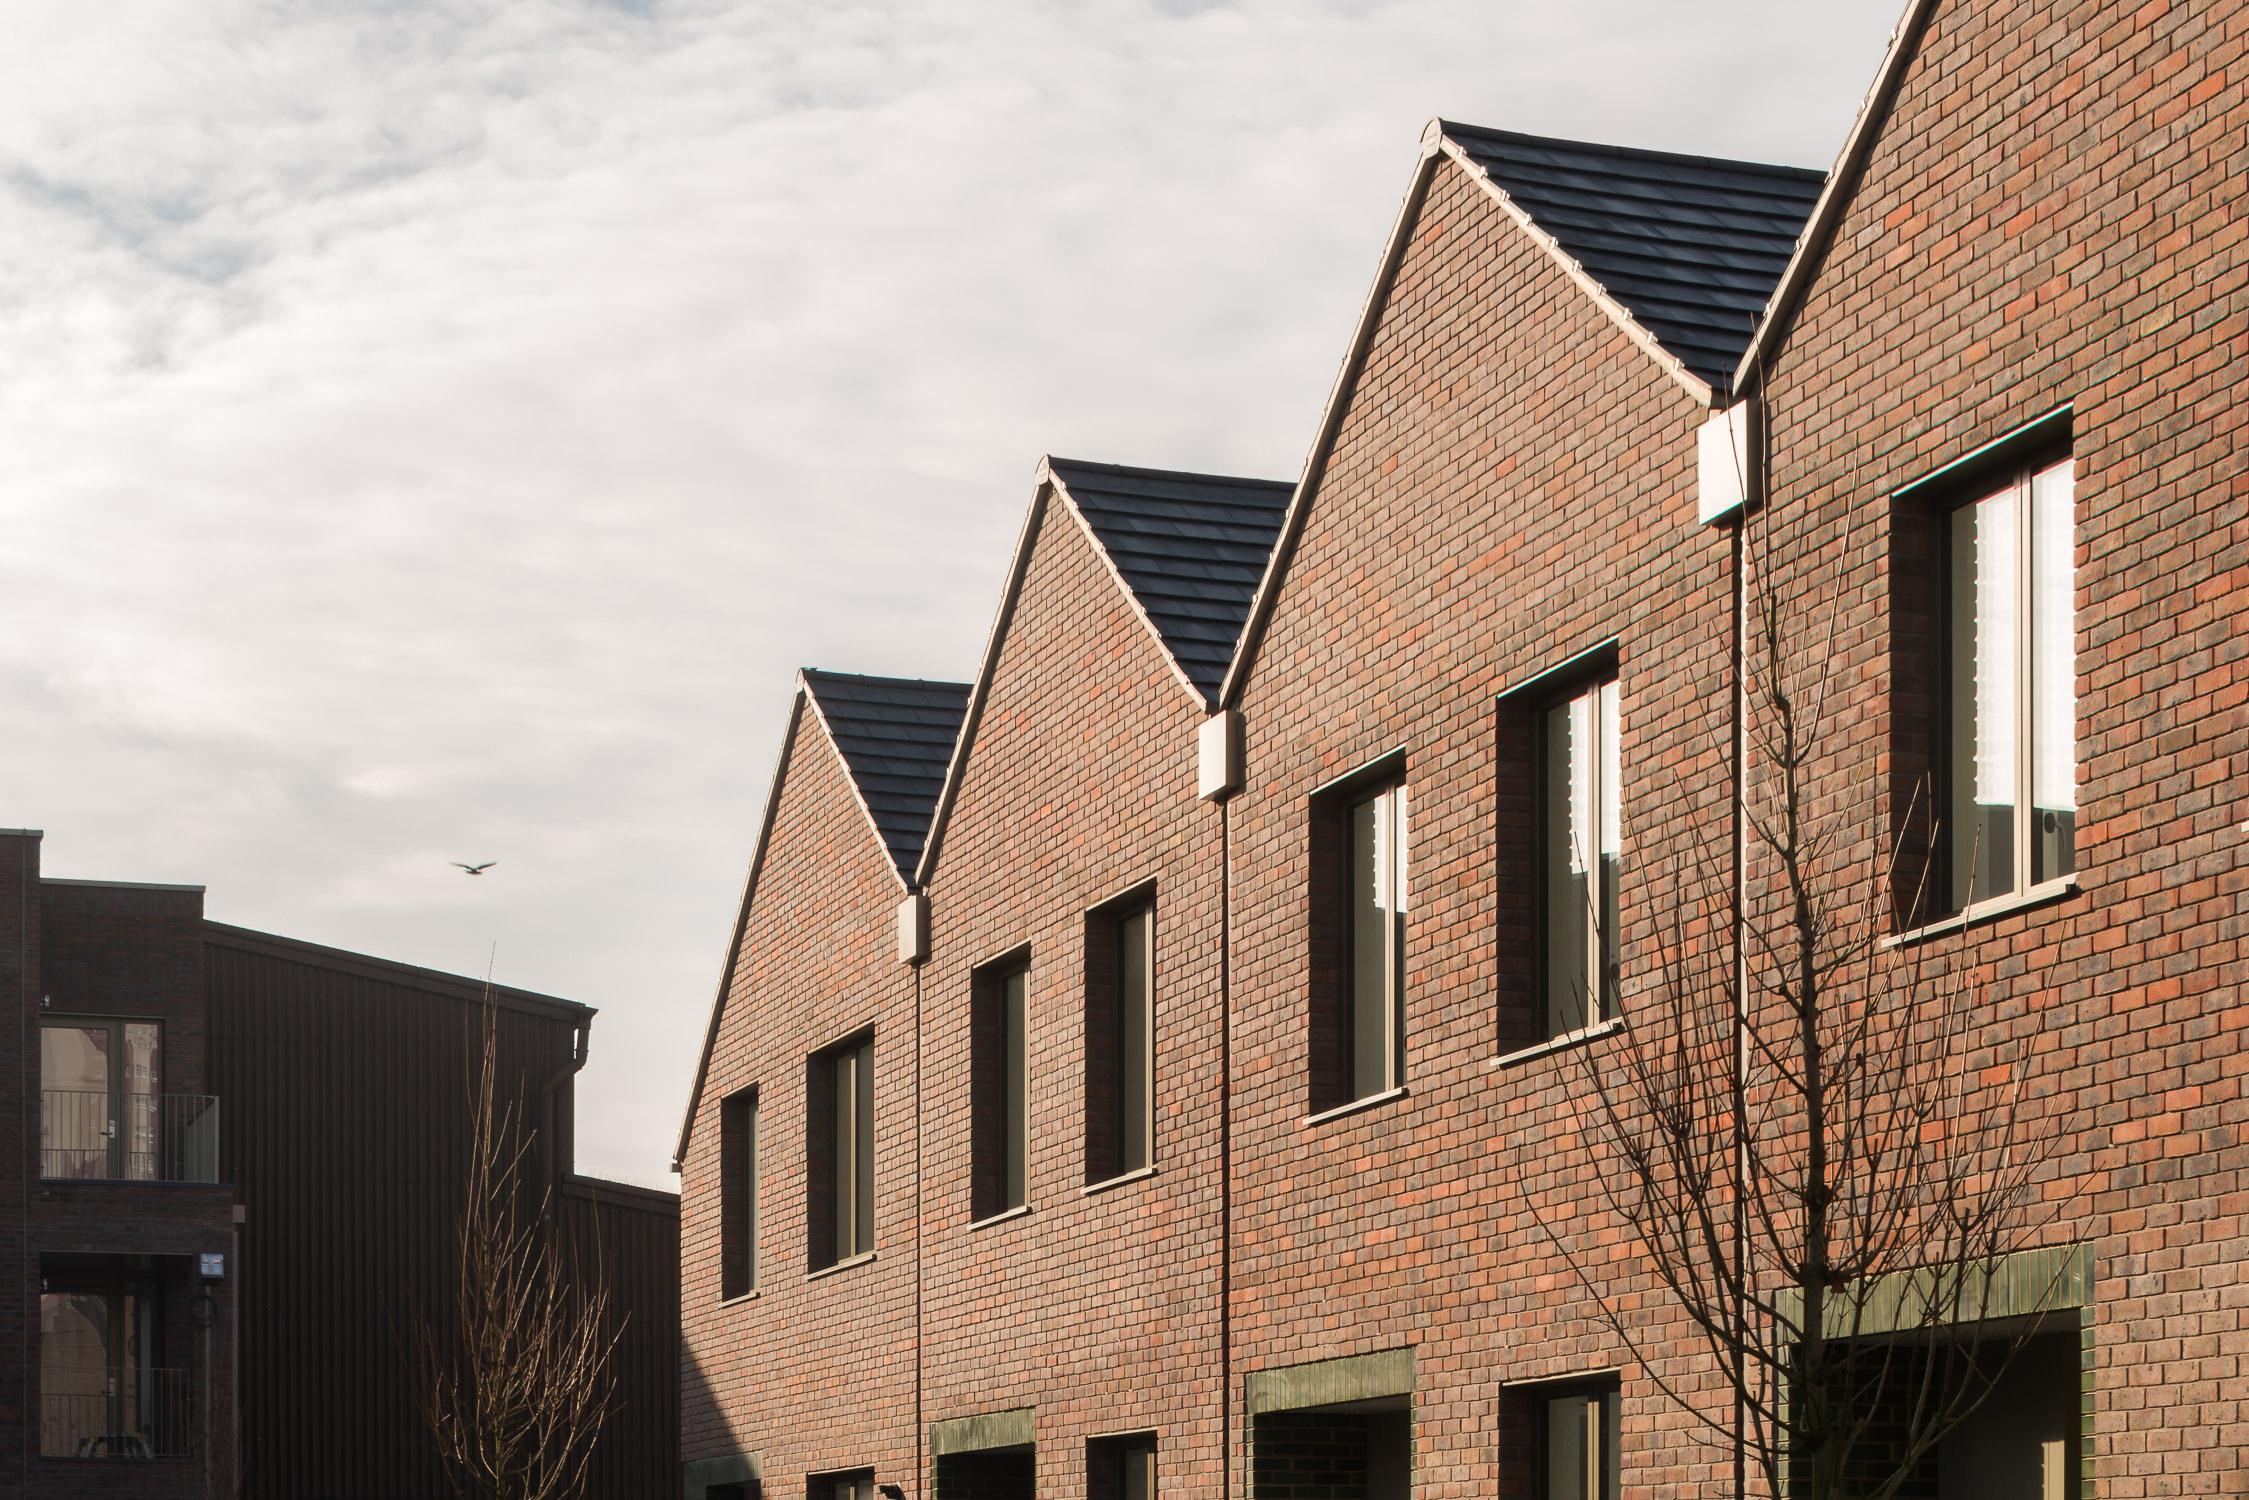 mark-hadden-architecture-photographer-architectuur-interieur-fotografie-london-amsterdam-Dujardin Mews-126.jpg